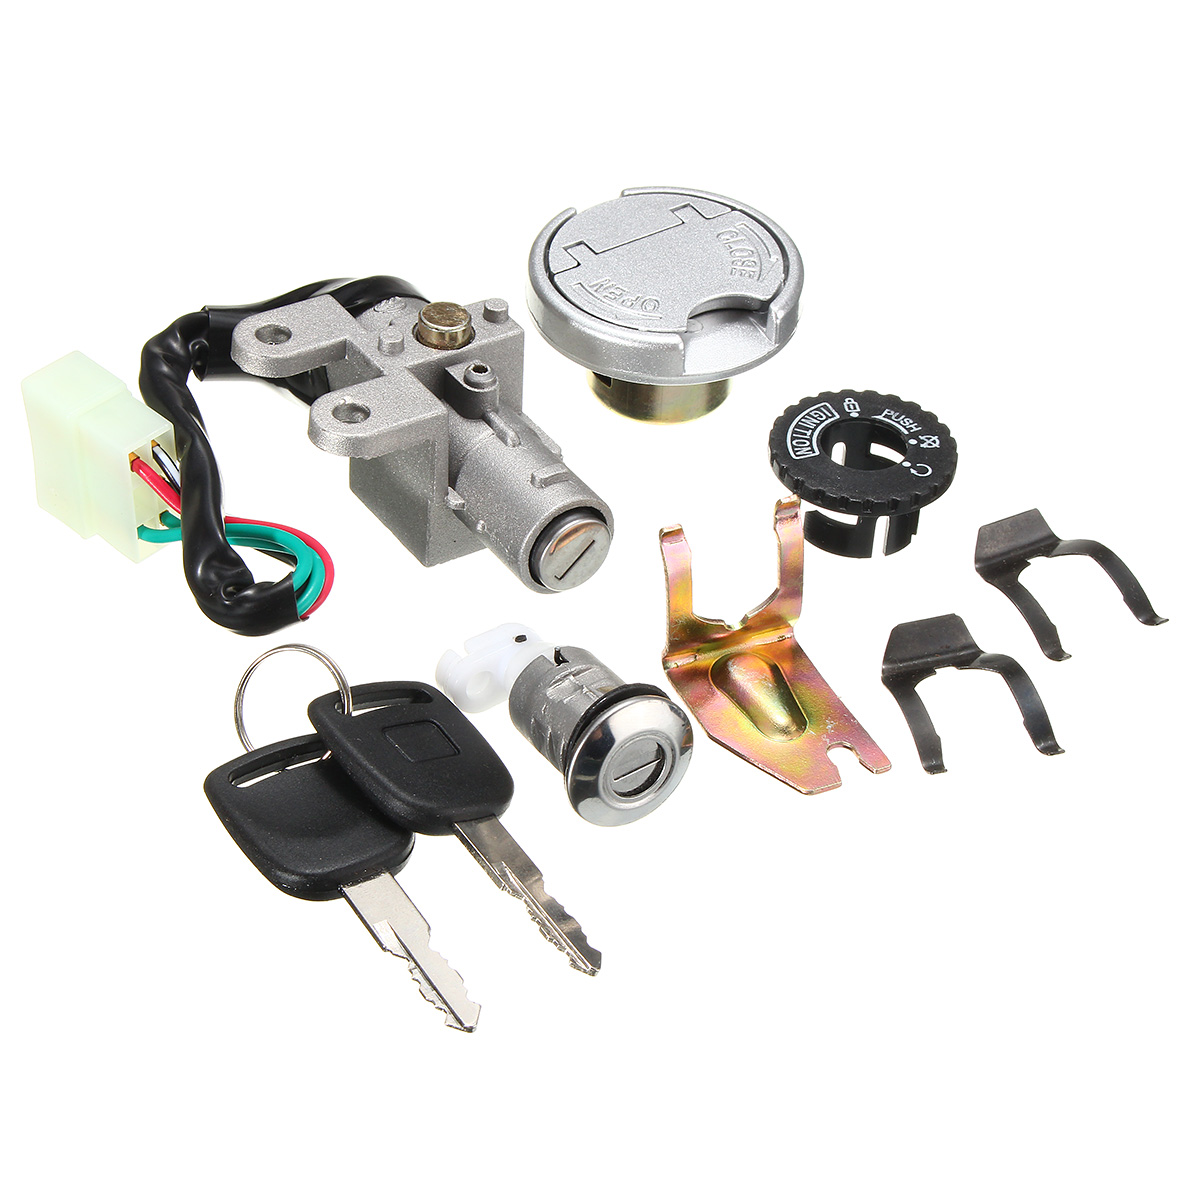 Unverisal Motorcycle Ignition Lock Switch Fuel Tank Cap 2 Keys For GY6 50CC Baotian Benzhou Buffalo Ering Jmstar Jack Fox REX